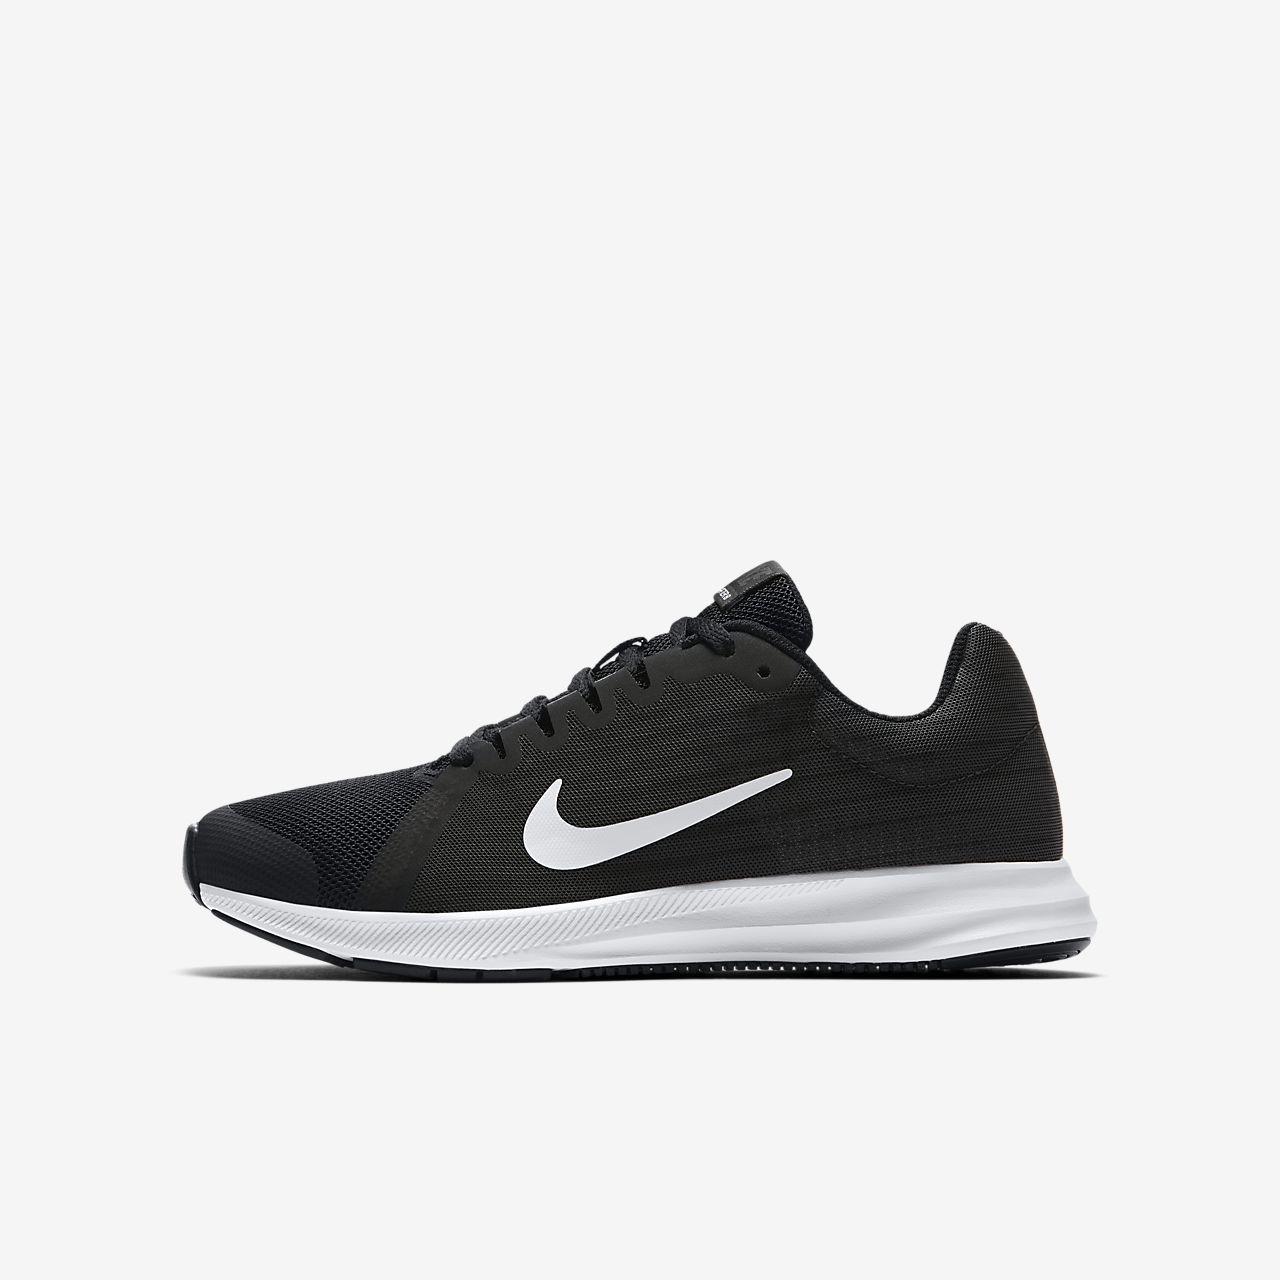 buy sale promo code latest discount Nike Downshifter 8 Laufschuh für ältere Kinder (Jungen)